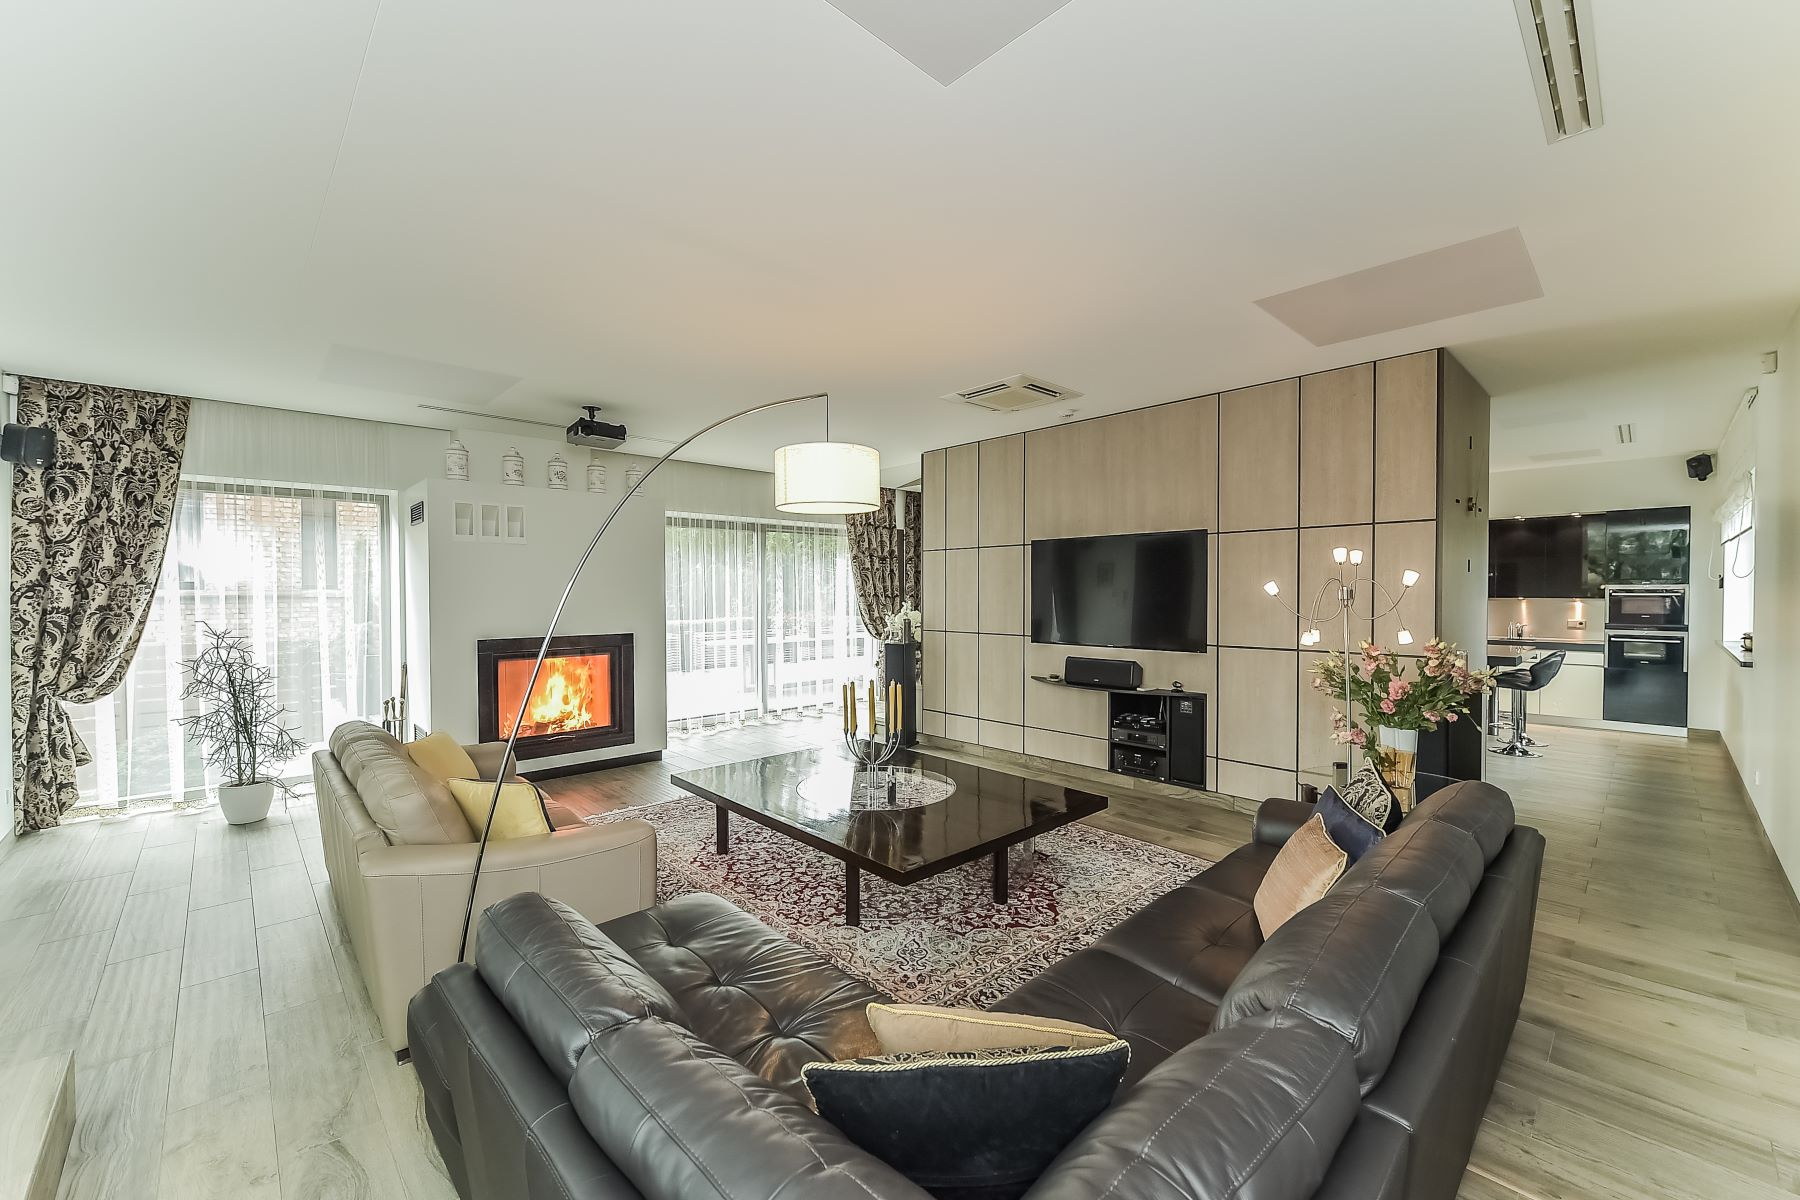 Single Family Home for Sale at A SPACIOUS HOUSE IN ŽALIAKALNIS QUARTER Kaunas, Kaunas County Lithuania